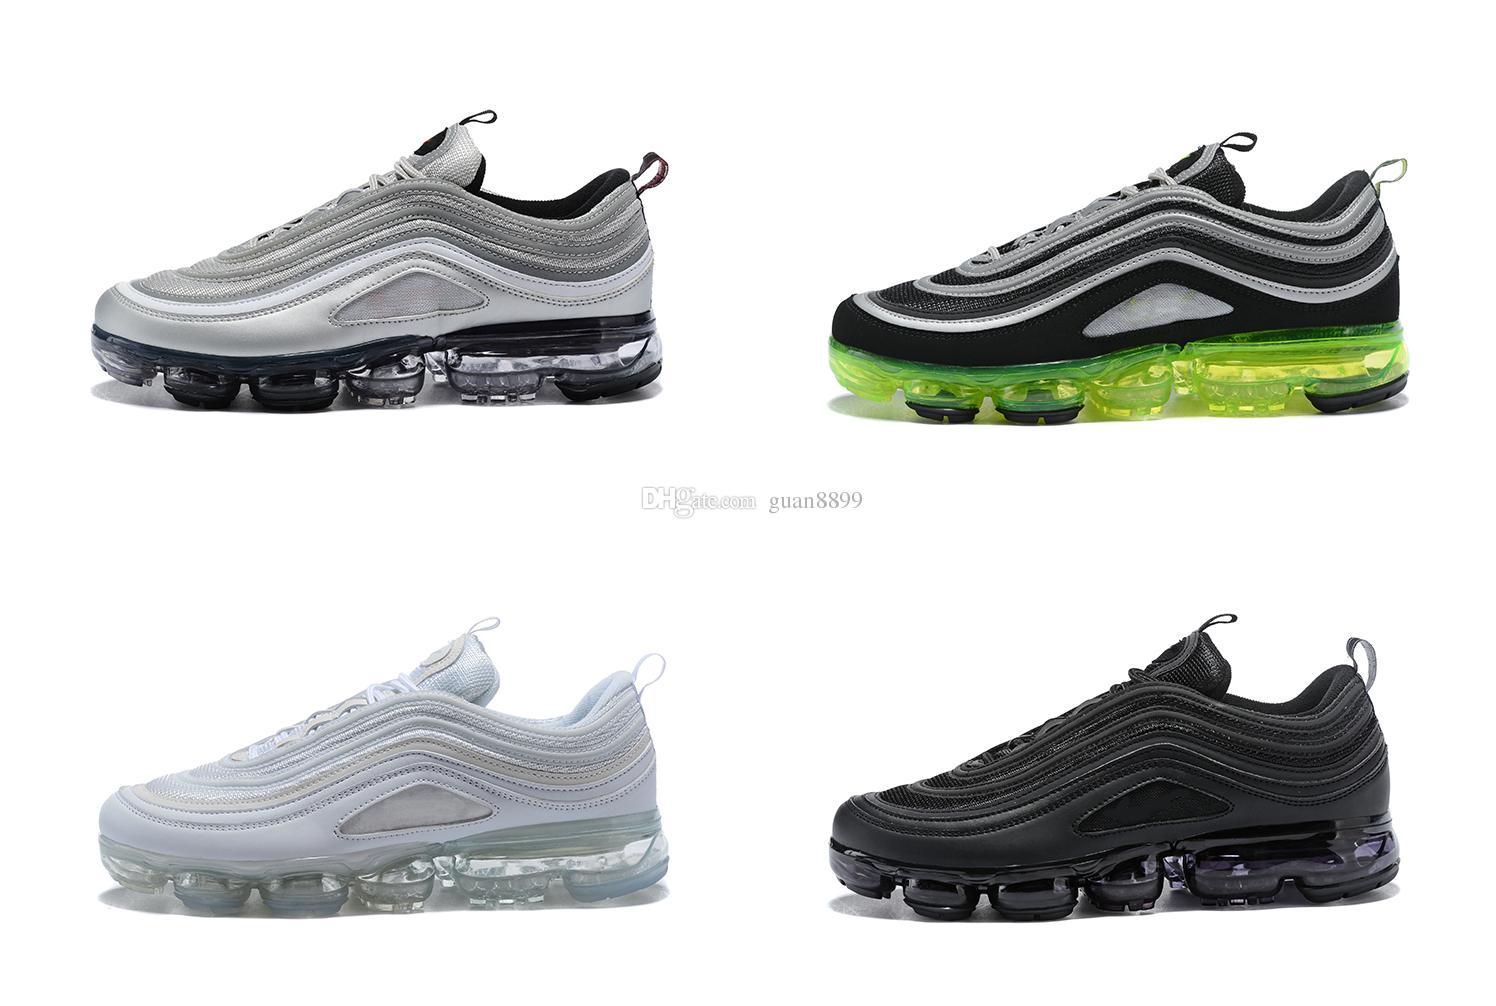 visa payment sale online finishline for sale Hot sale 2018 new arrive vapormaxes 97 Men Women casual shoes 8903 97 unisex outdoor Walking Shoes 36-45 cy B0B5lL1PC